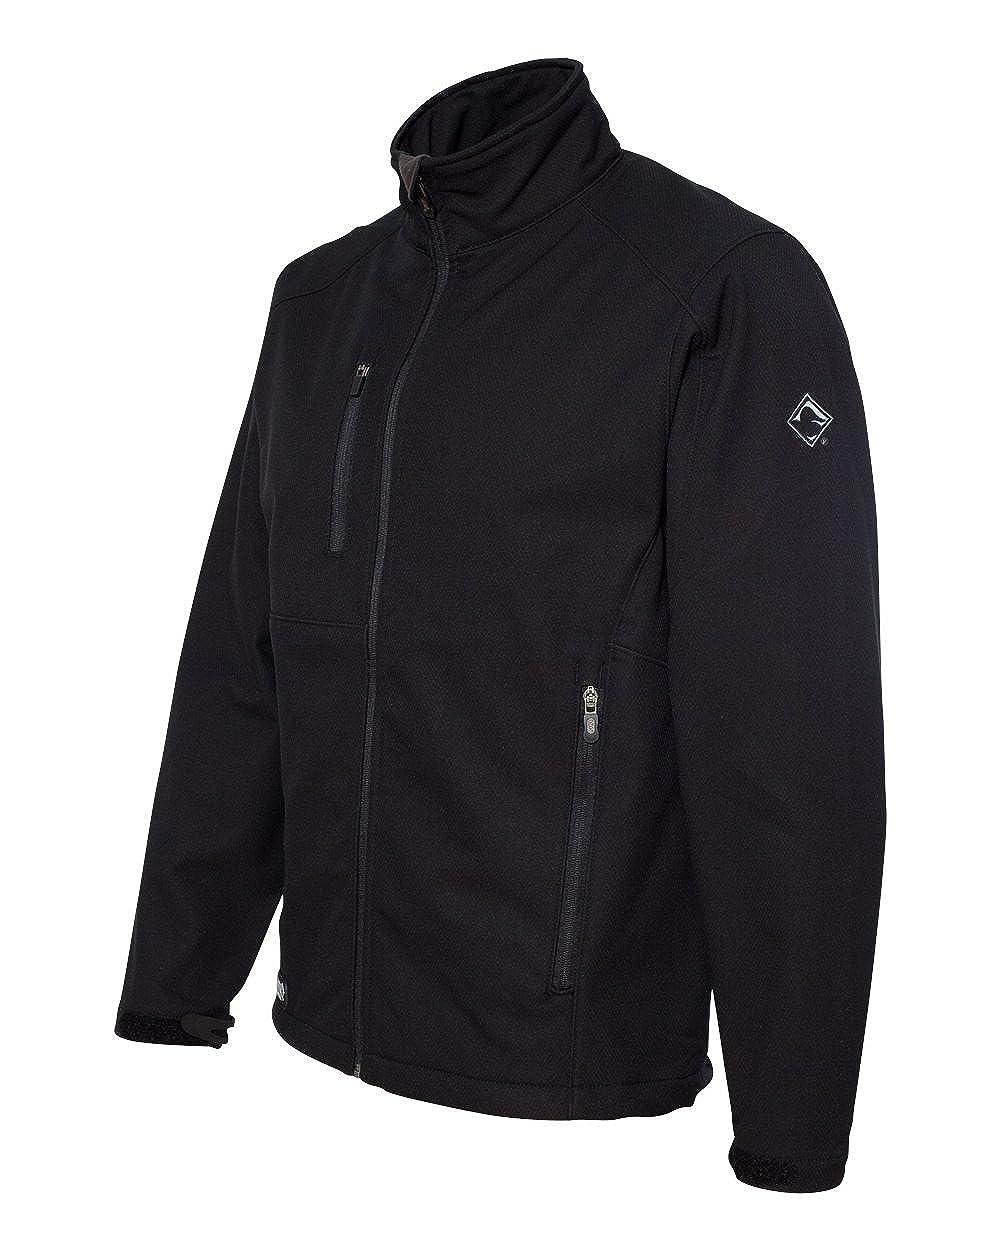 5365 Black Dri-Duck Mens Dri Duck Acceleration Waterproof Softshell Jacket